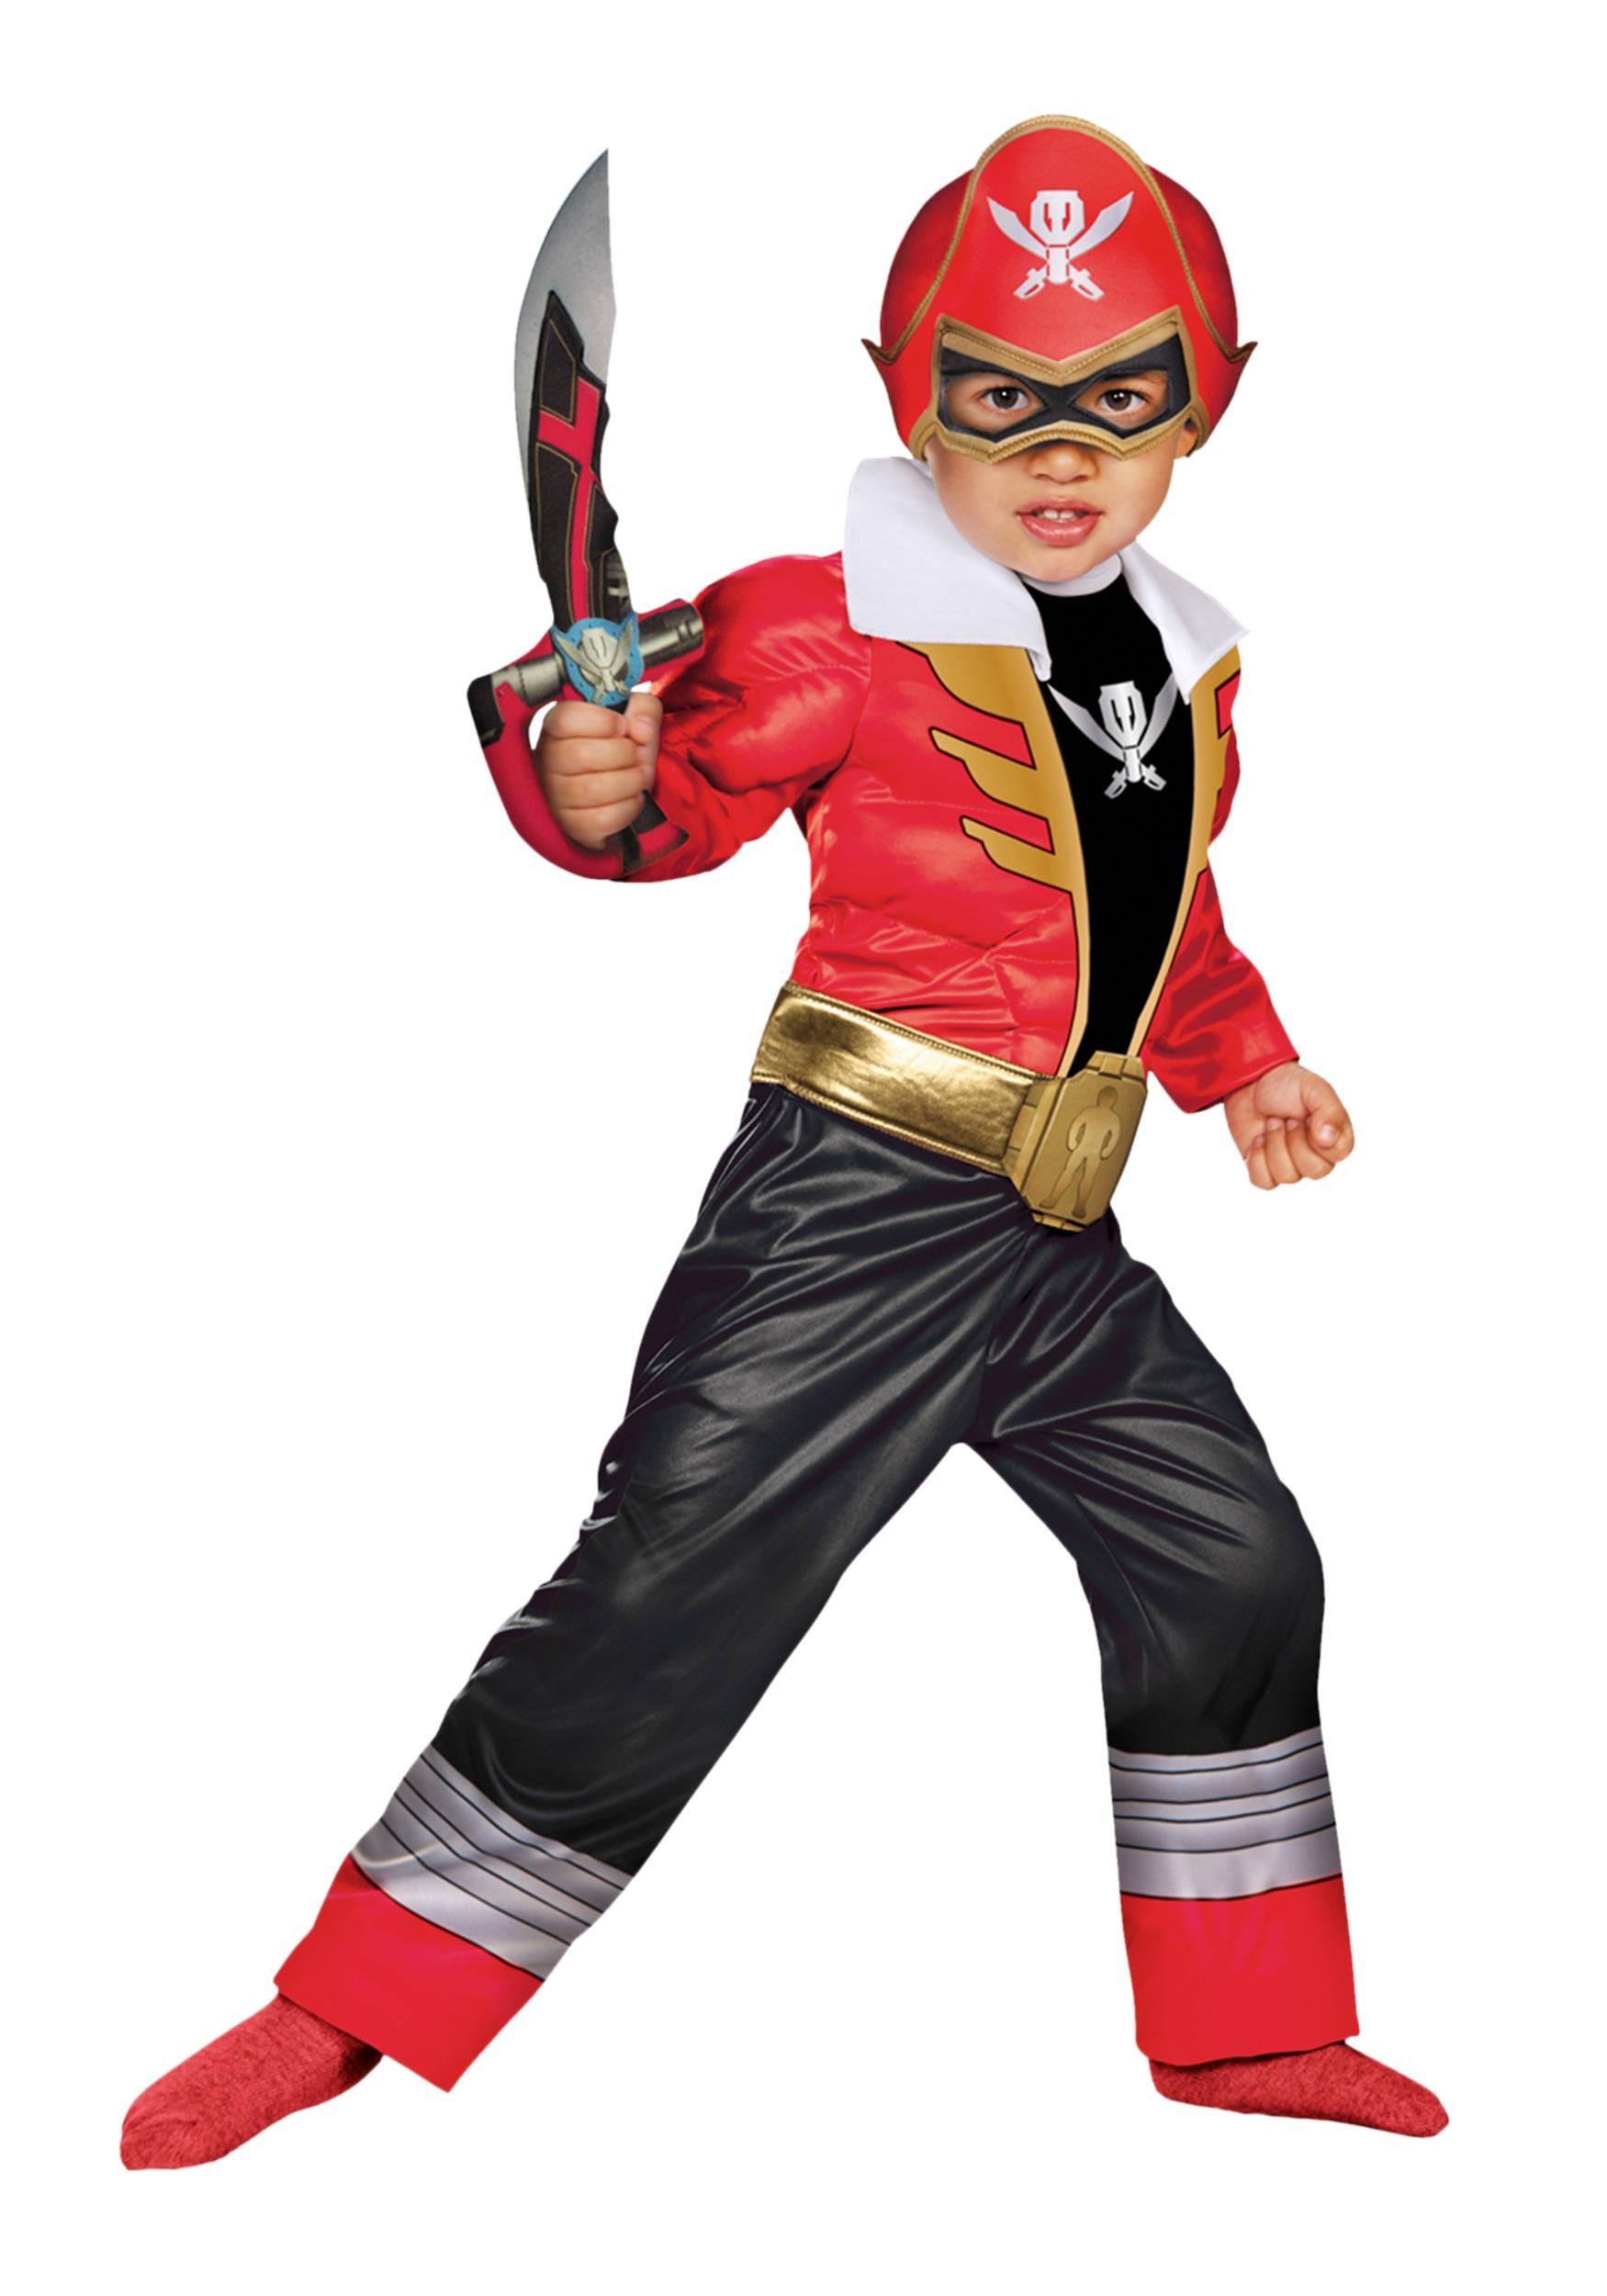 Toddler Super Megaforce Red Power Ranger Muscle Costume  sc 1 st  Halloween Costumes & Toddler Super Megaforce Red Power Ranger Muscle Costume - Halloween ...